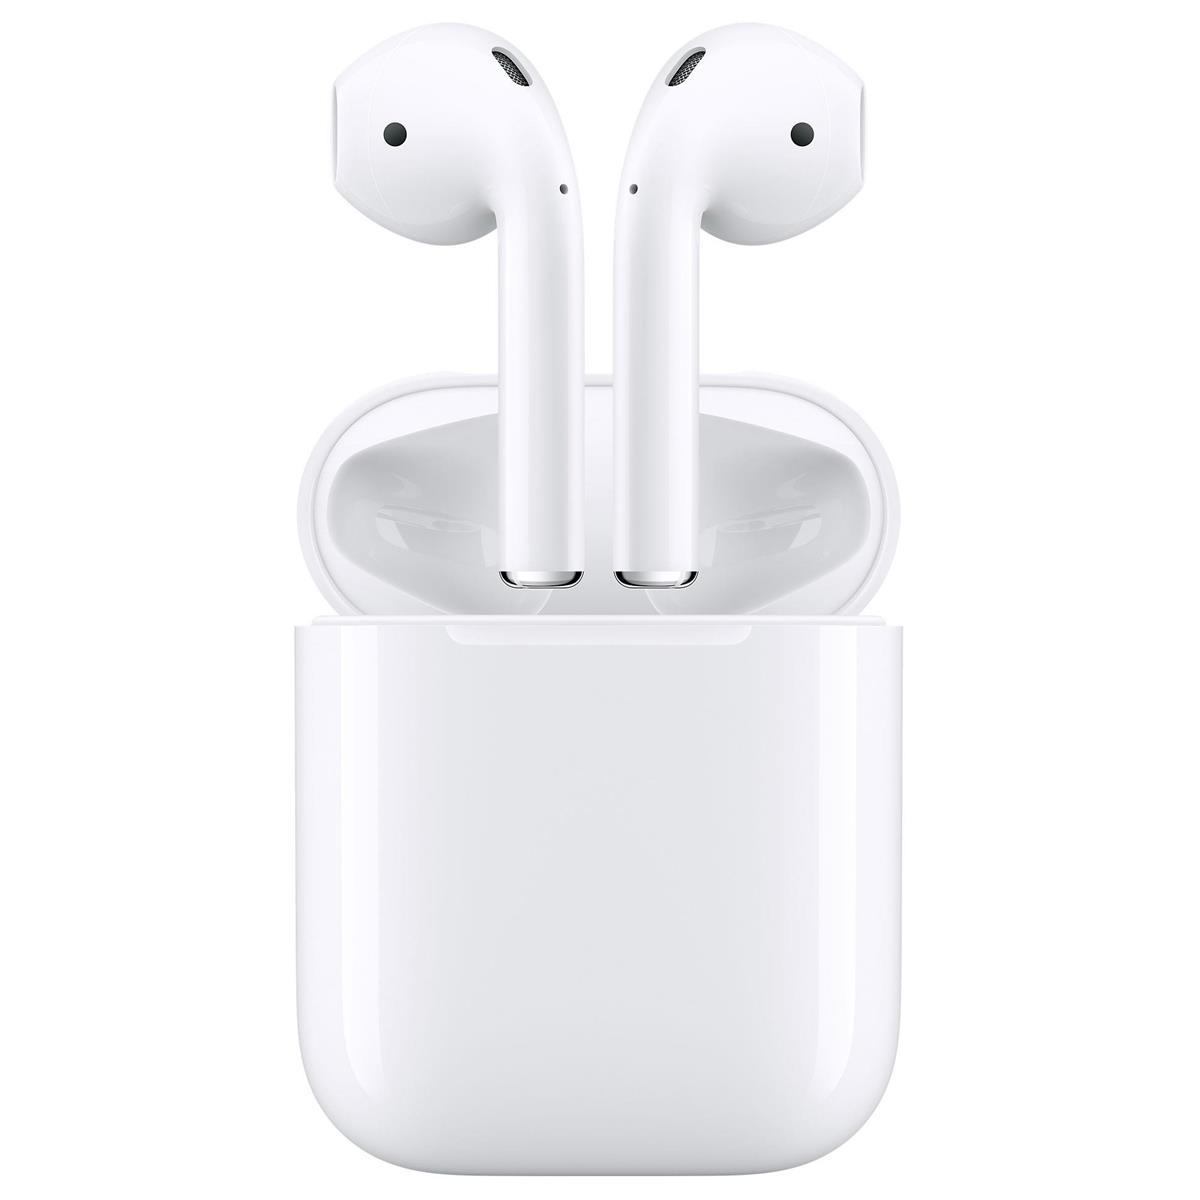 Apple AirPods $140 at Adorama